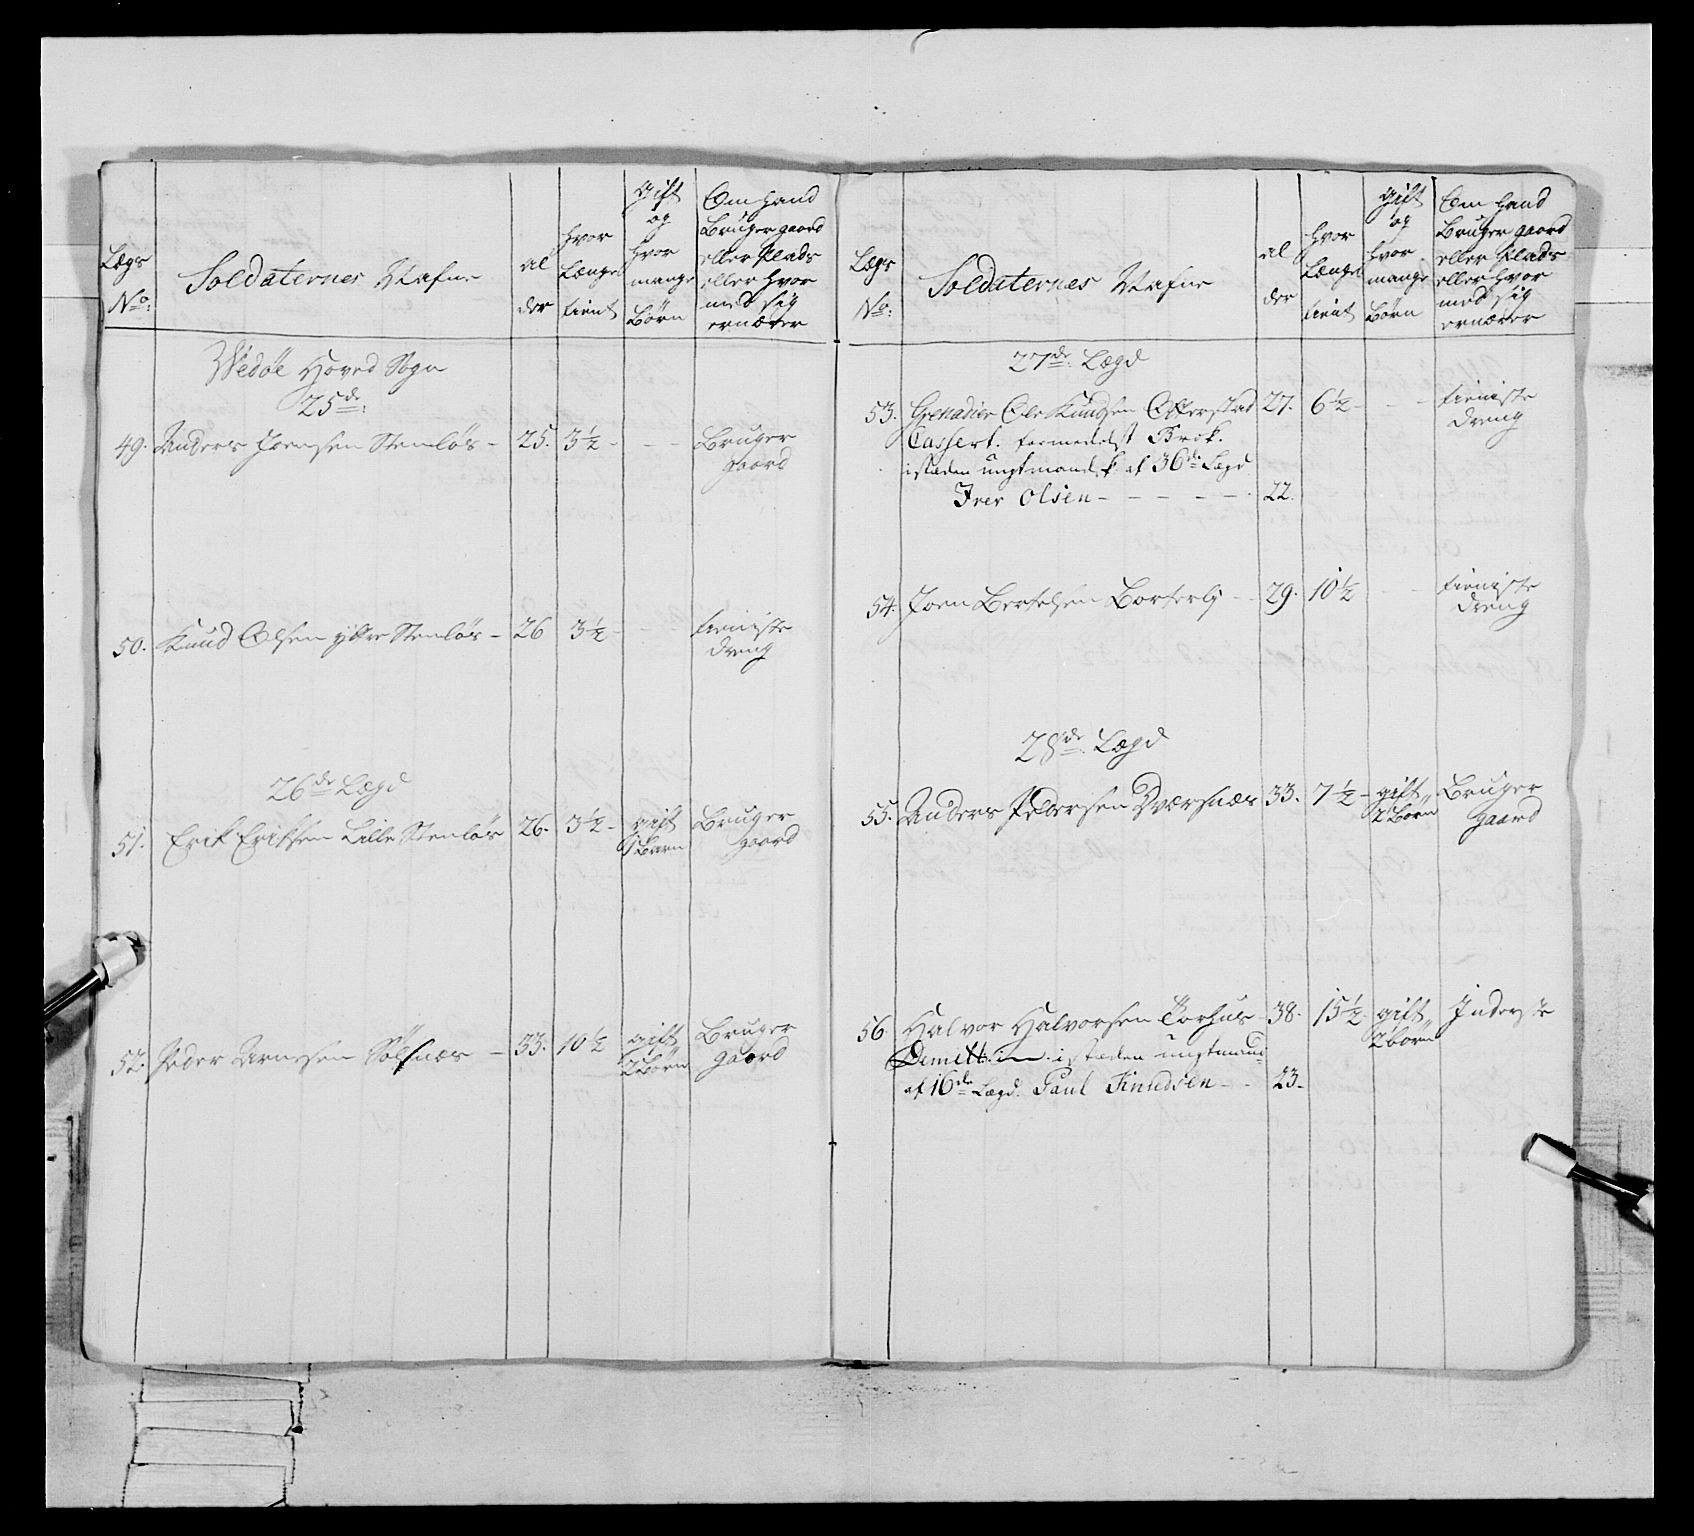 RA, Generalitets- og kommissariatskollegiet, Det kongelige norske kommissariatskollegium, E/Eh/L0076: 2. Trondheimske nasjonale infanteriregiment, 1766-1773, p. 475